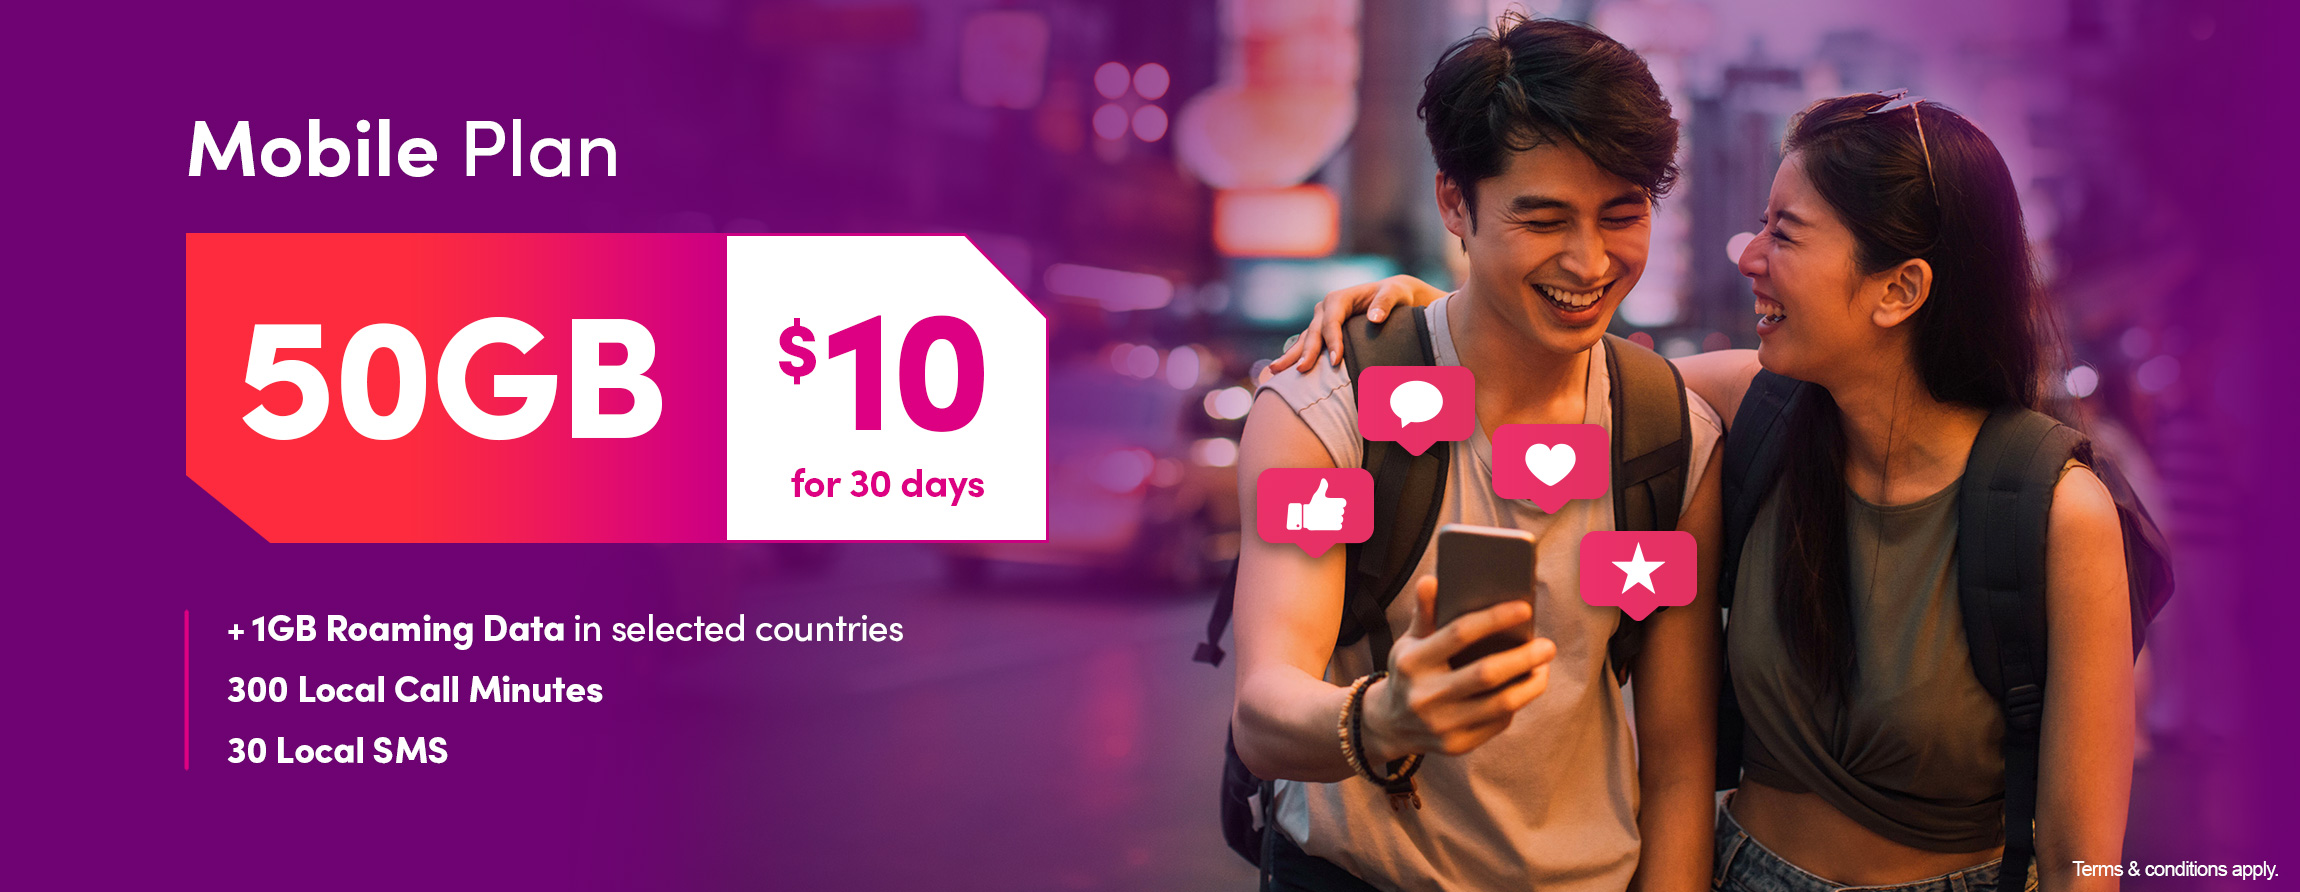 TPG Telecom $10 for 50GB SIM-only plan banner